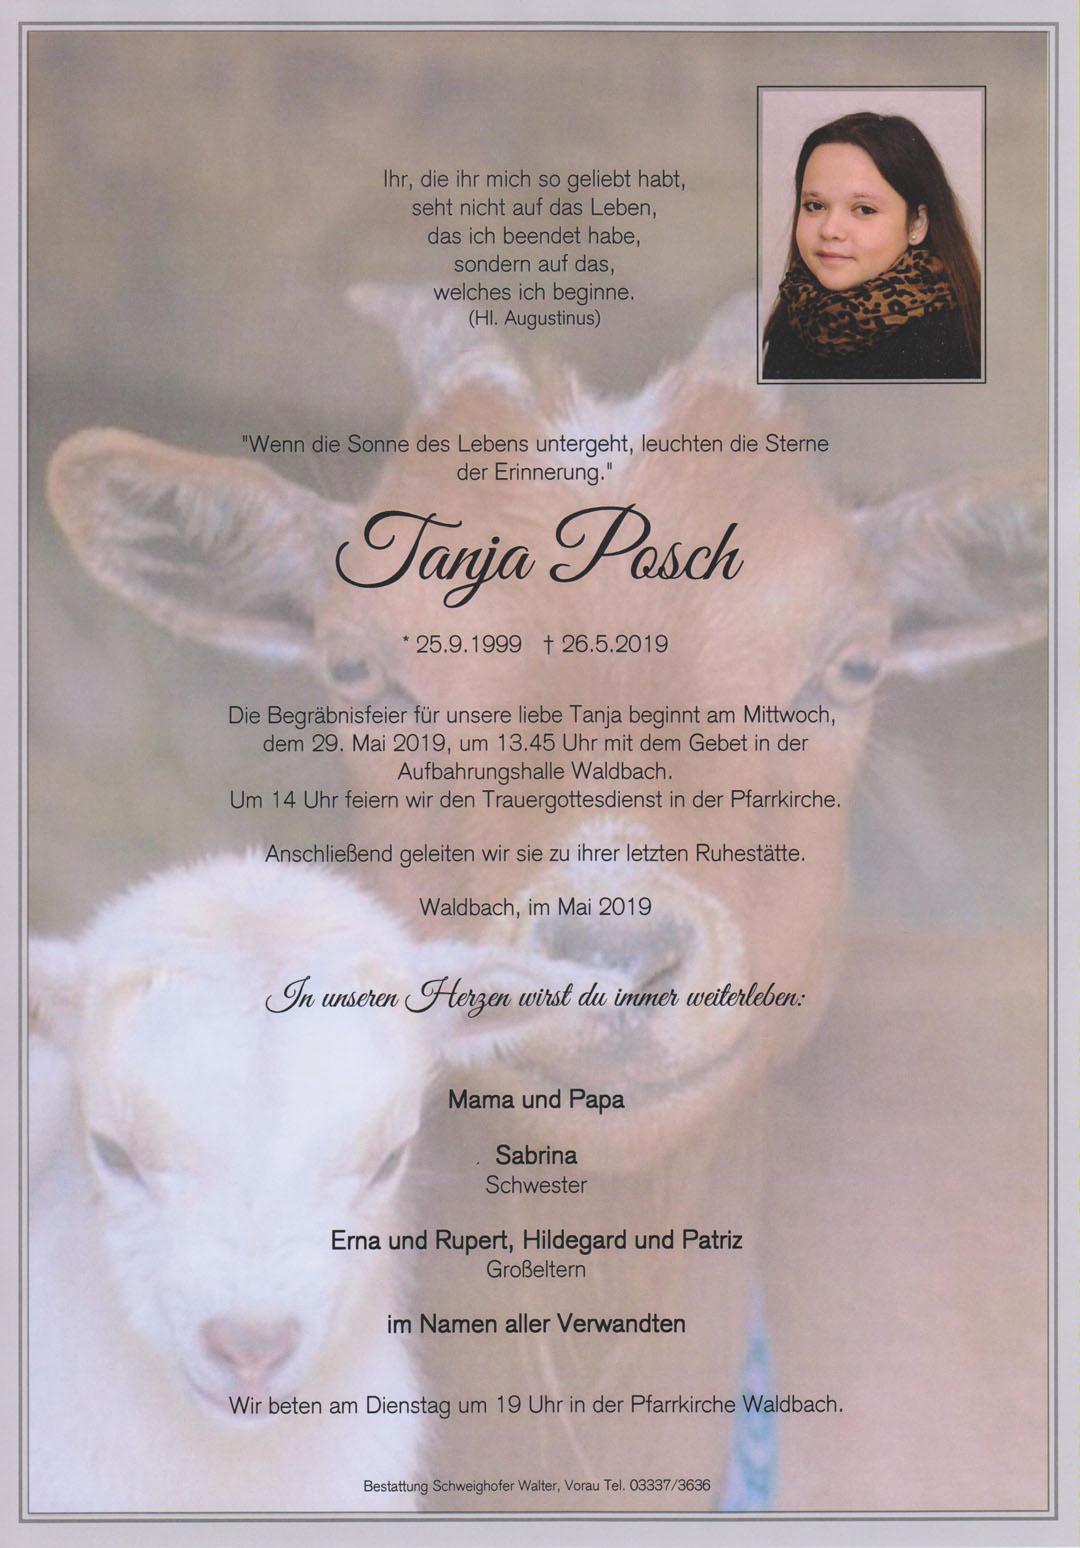 Tanja Posch